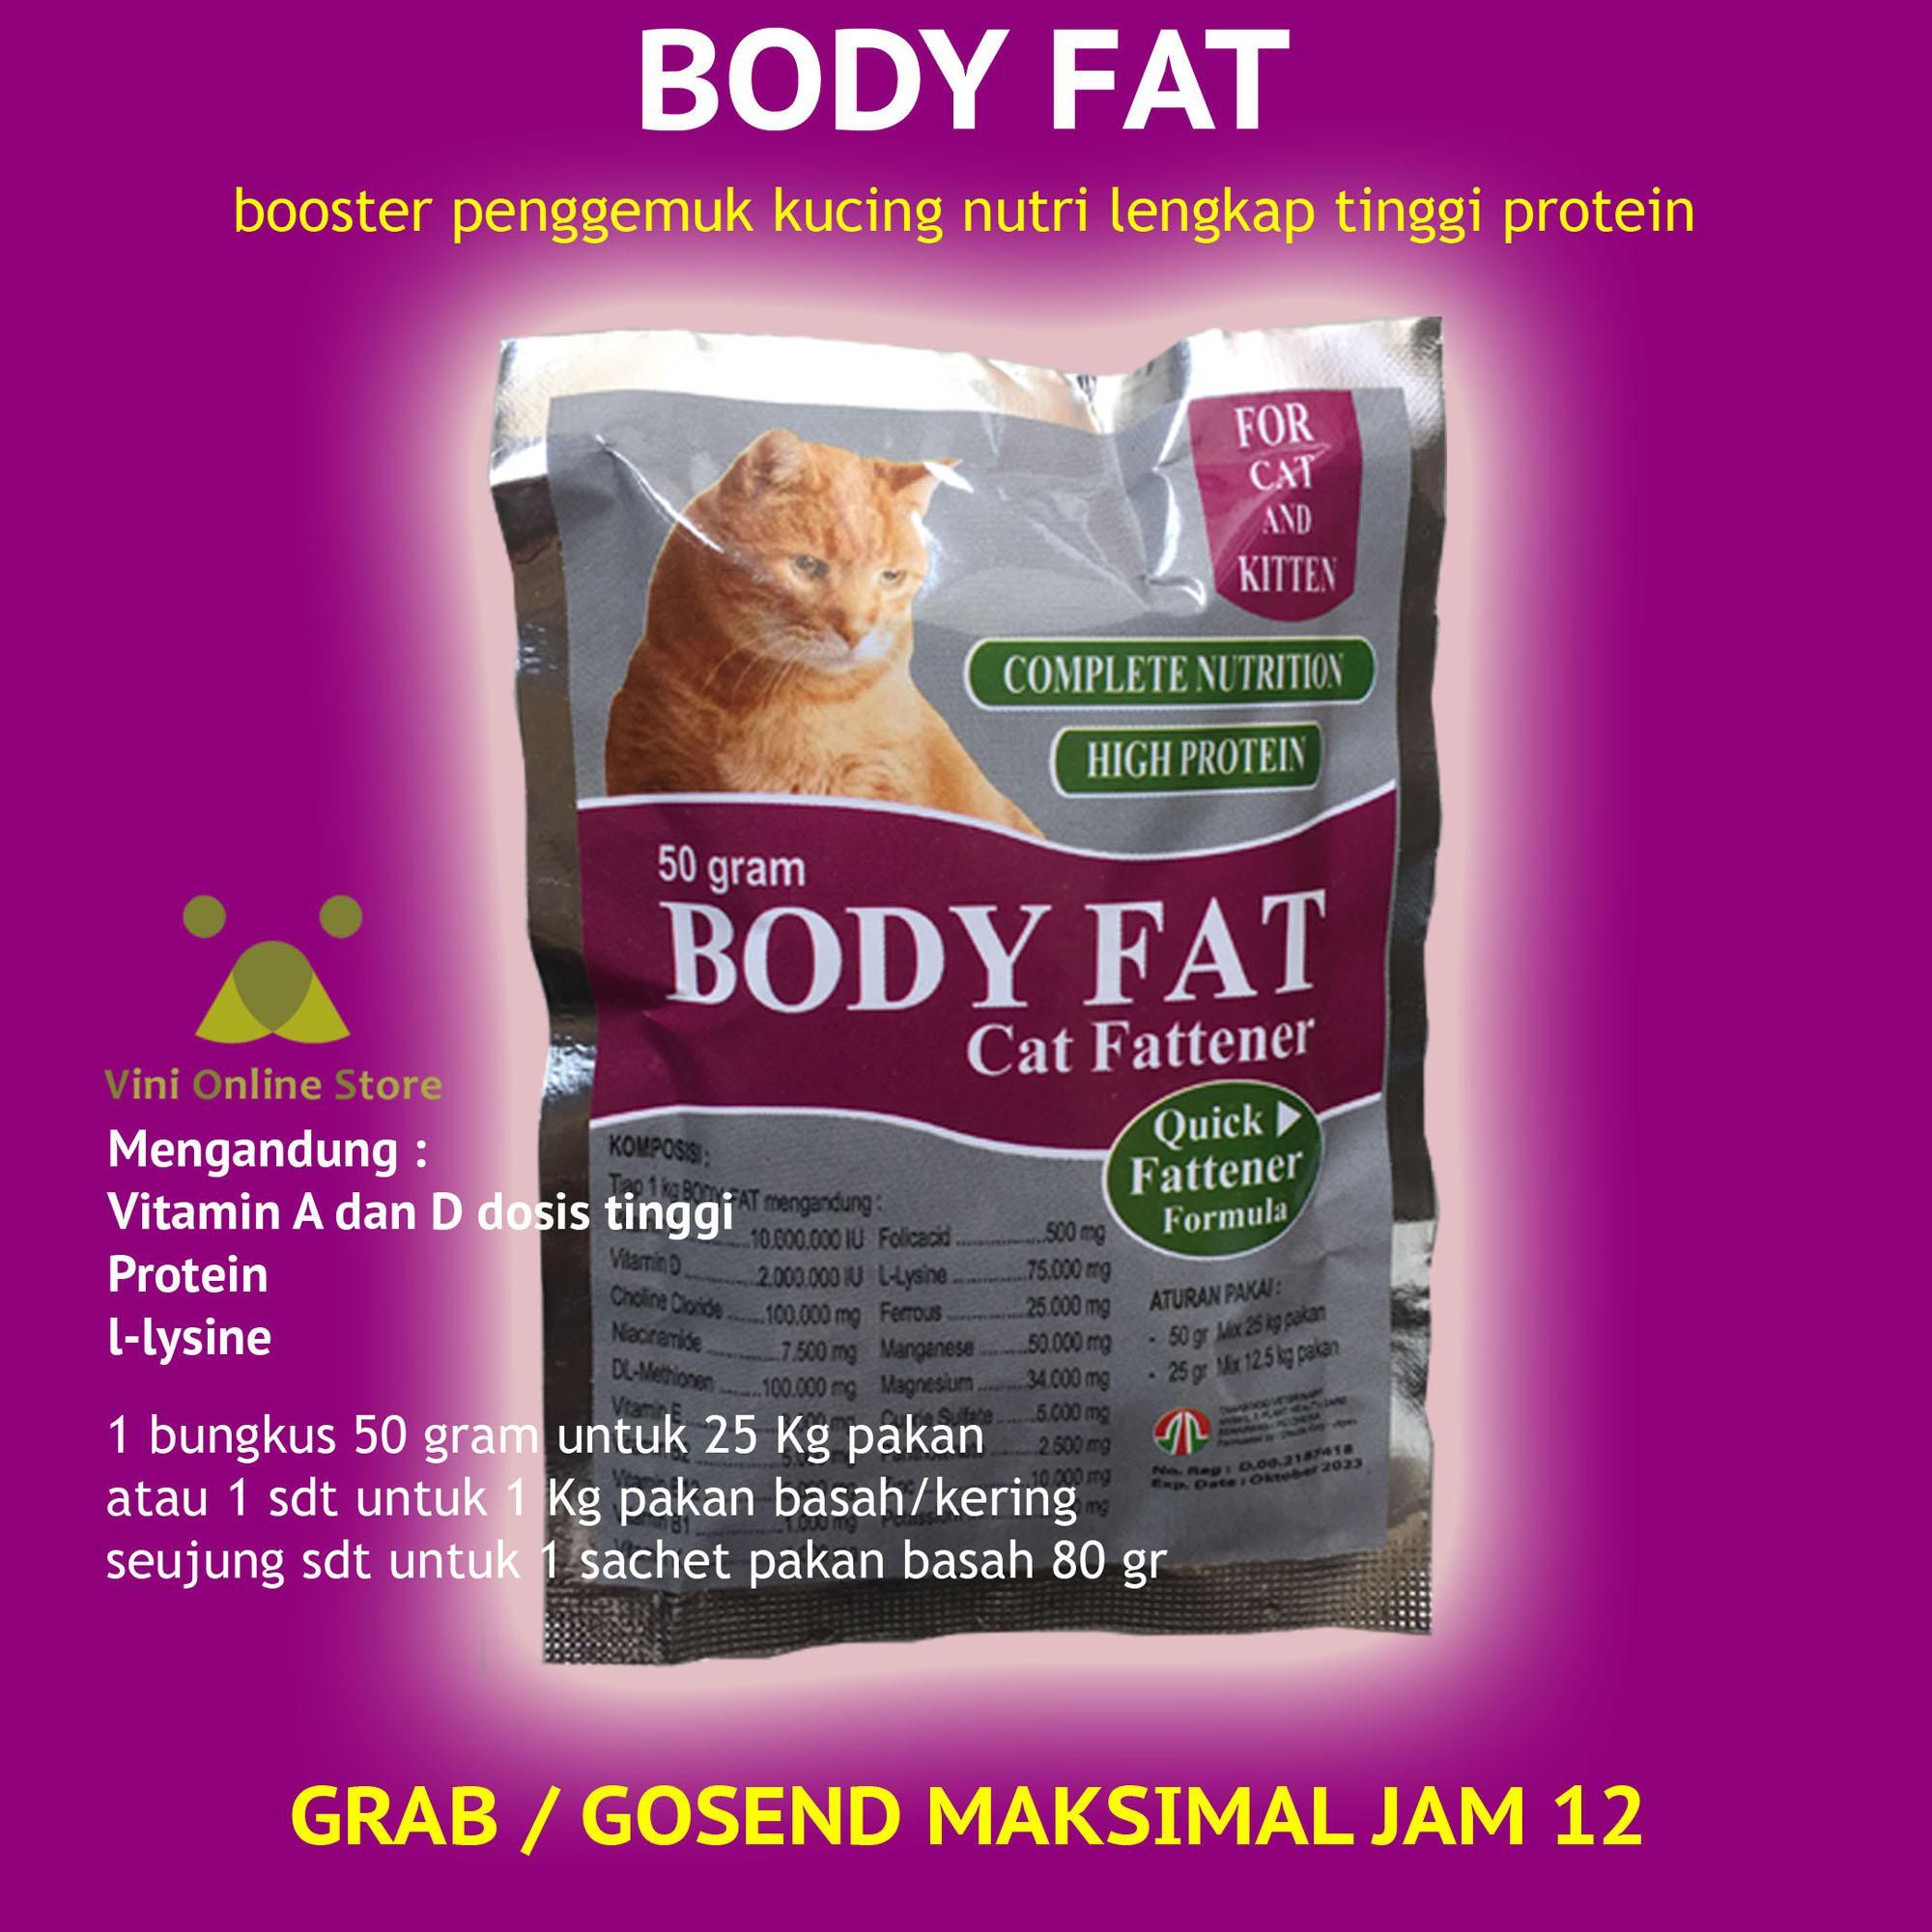 Body Fat Vitamin Booster Penggemuk Kucing By Vini Store.